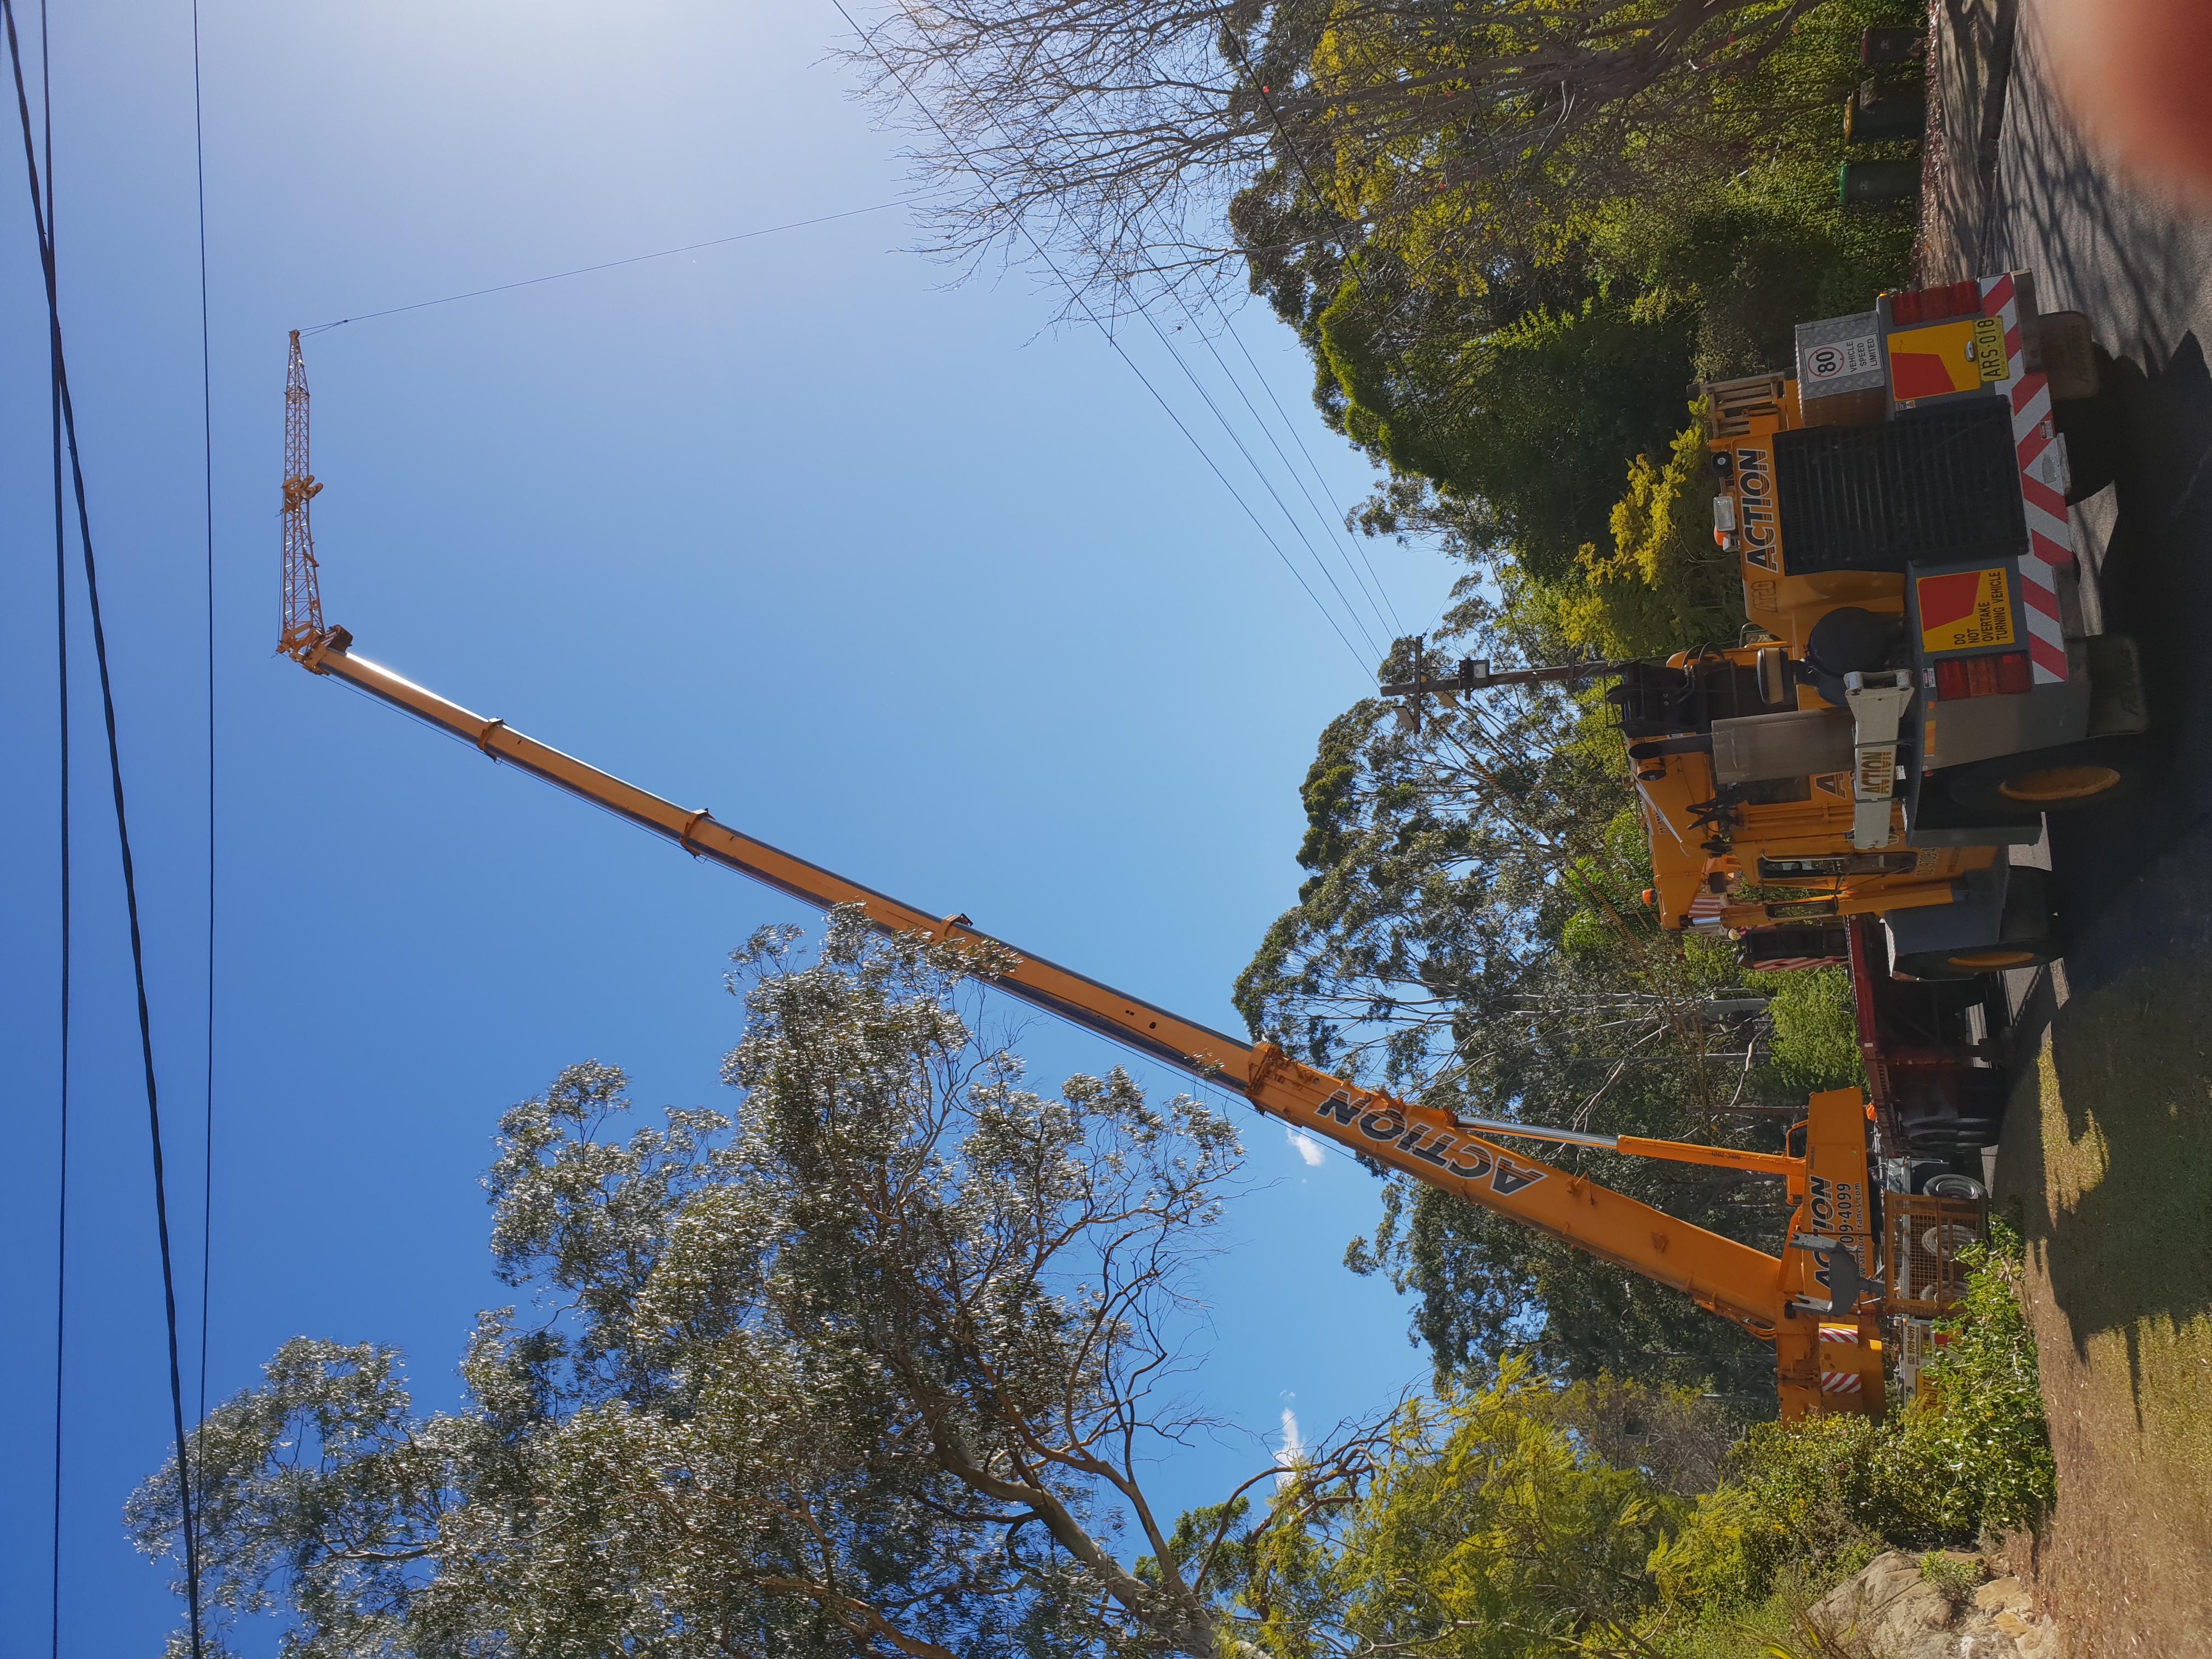 action-cranes-mobile-crane-sydney-hire-rental-mobile-crane-lifting-1-6-v1